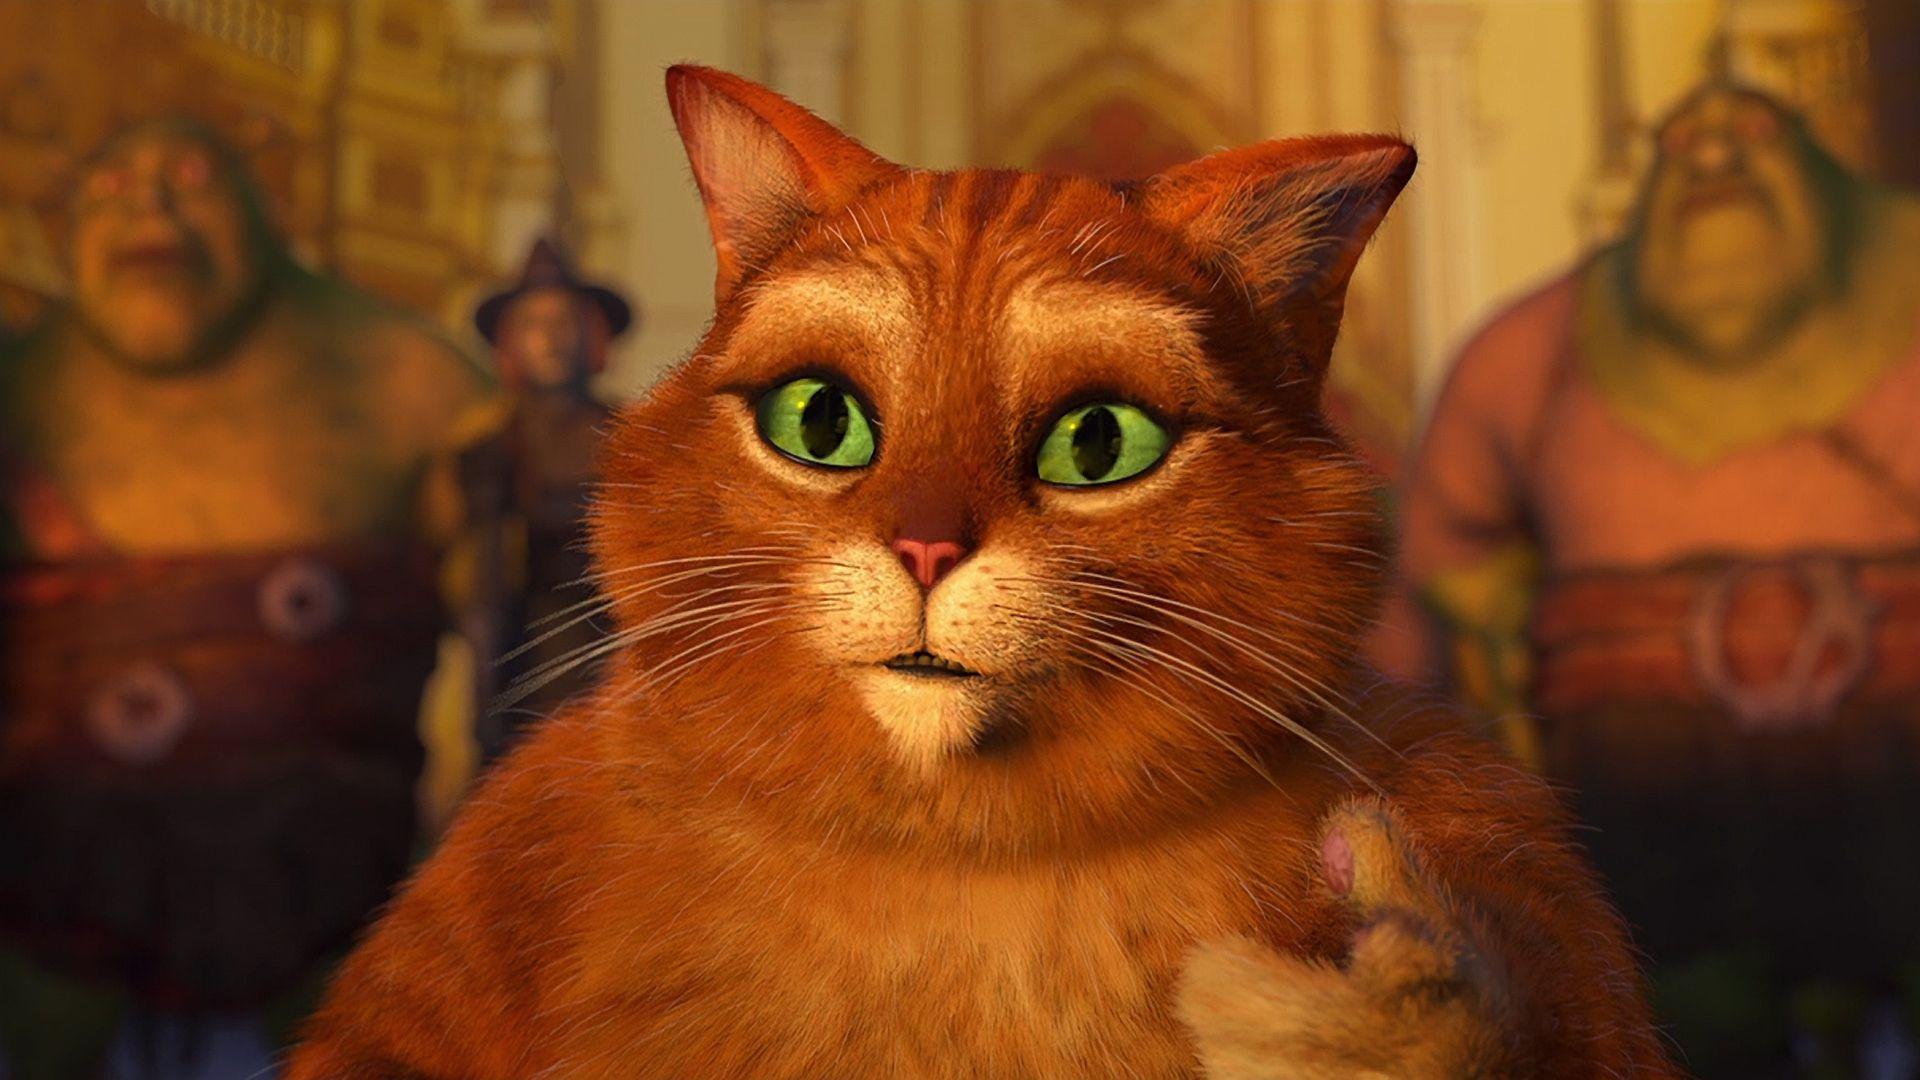 Картинка кота из мультика шрека